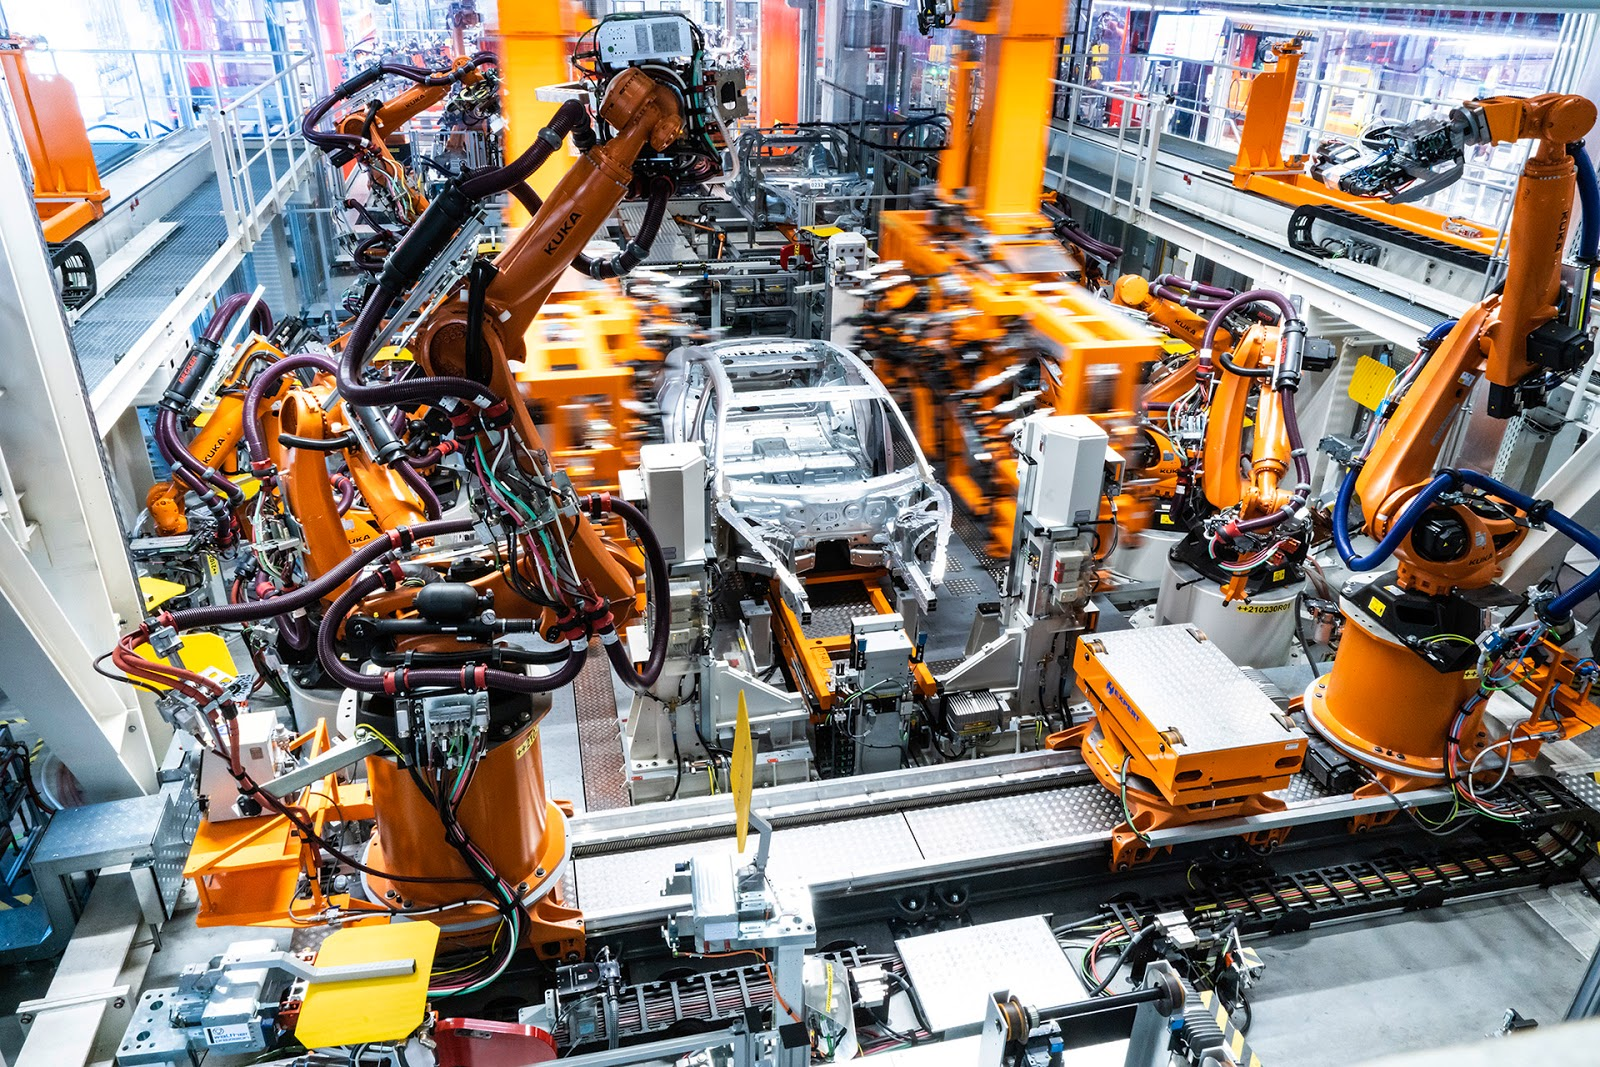 AUDI2B 2B25CE259525CE259D25CE259125CE25A125CE259E25CE25972B25CE25A025CE259125CE25A125CE259125CE259325CE25A925CE259325CE259725CE25A32B25CE25A425CE259F25CE25A52BE TRON2BGT 4 1 Audi : Ξεκινάει η παραγωγή του e-tron GT Audi, Audi E-tron, E-tron, E-Tron GT, Electric cars, electric vehicles, EV, ειδήσεις, ηλεκτρικά, ηλεκτροκινηση